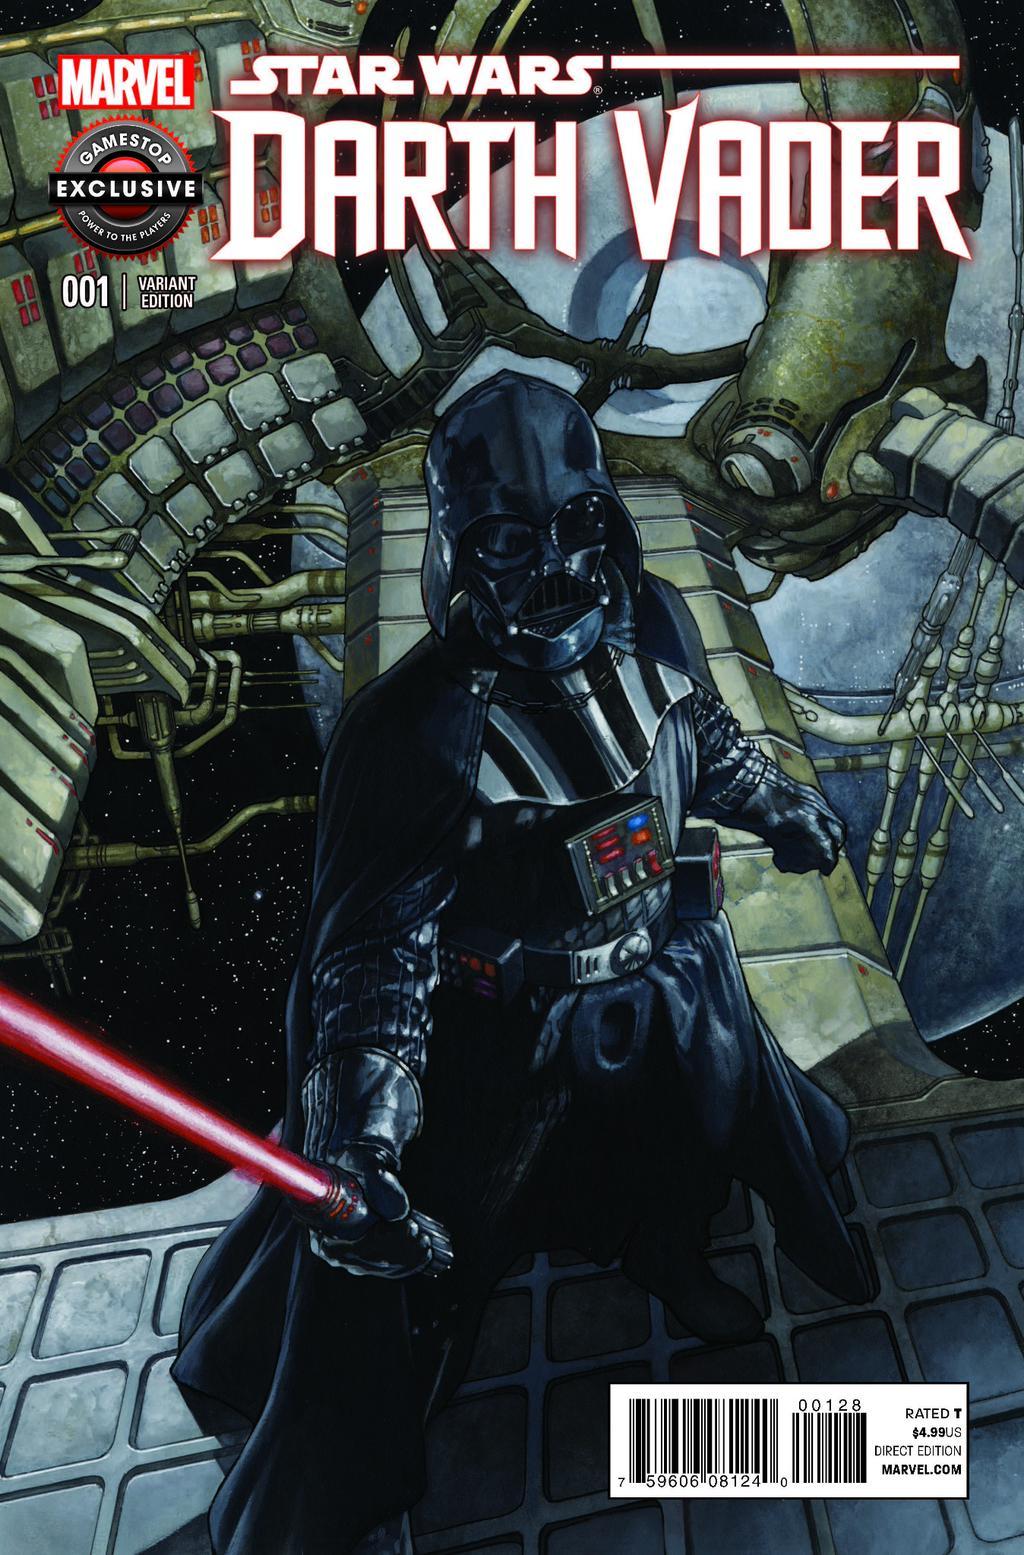 Darth Vader #1 (Simone Bianchi GameStop Variant Cover) (17.02.2015)